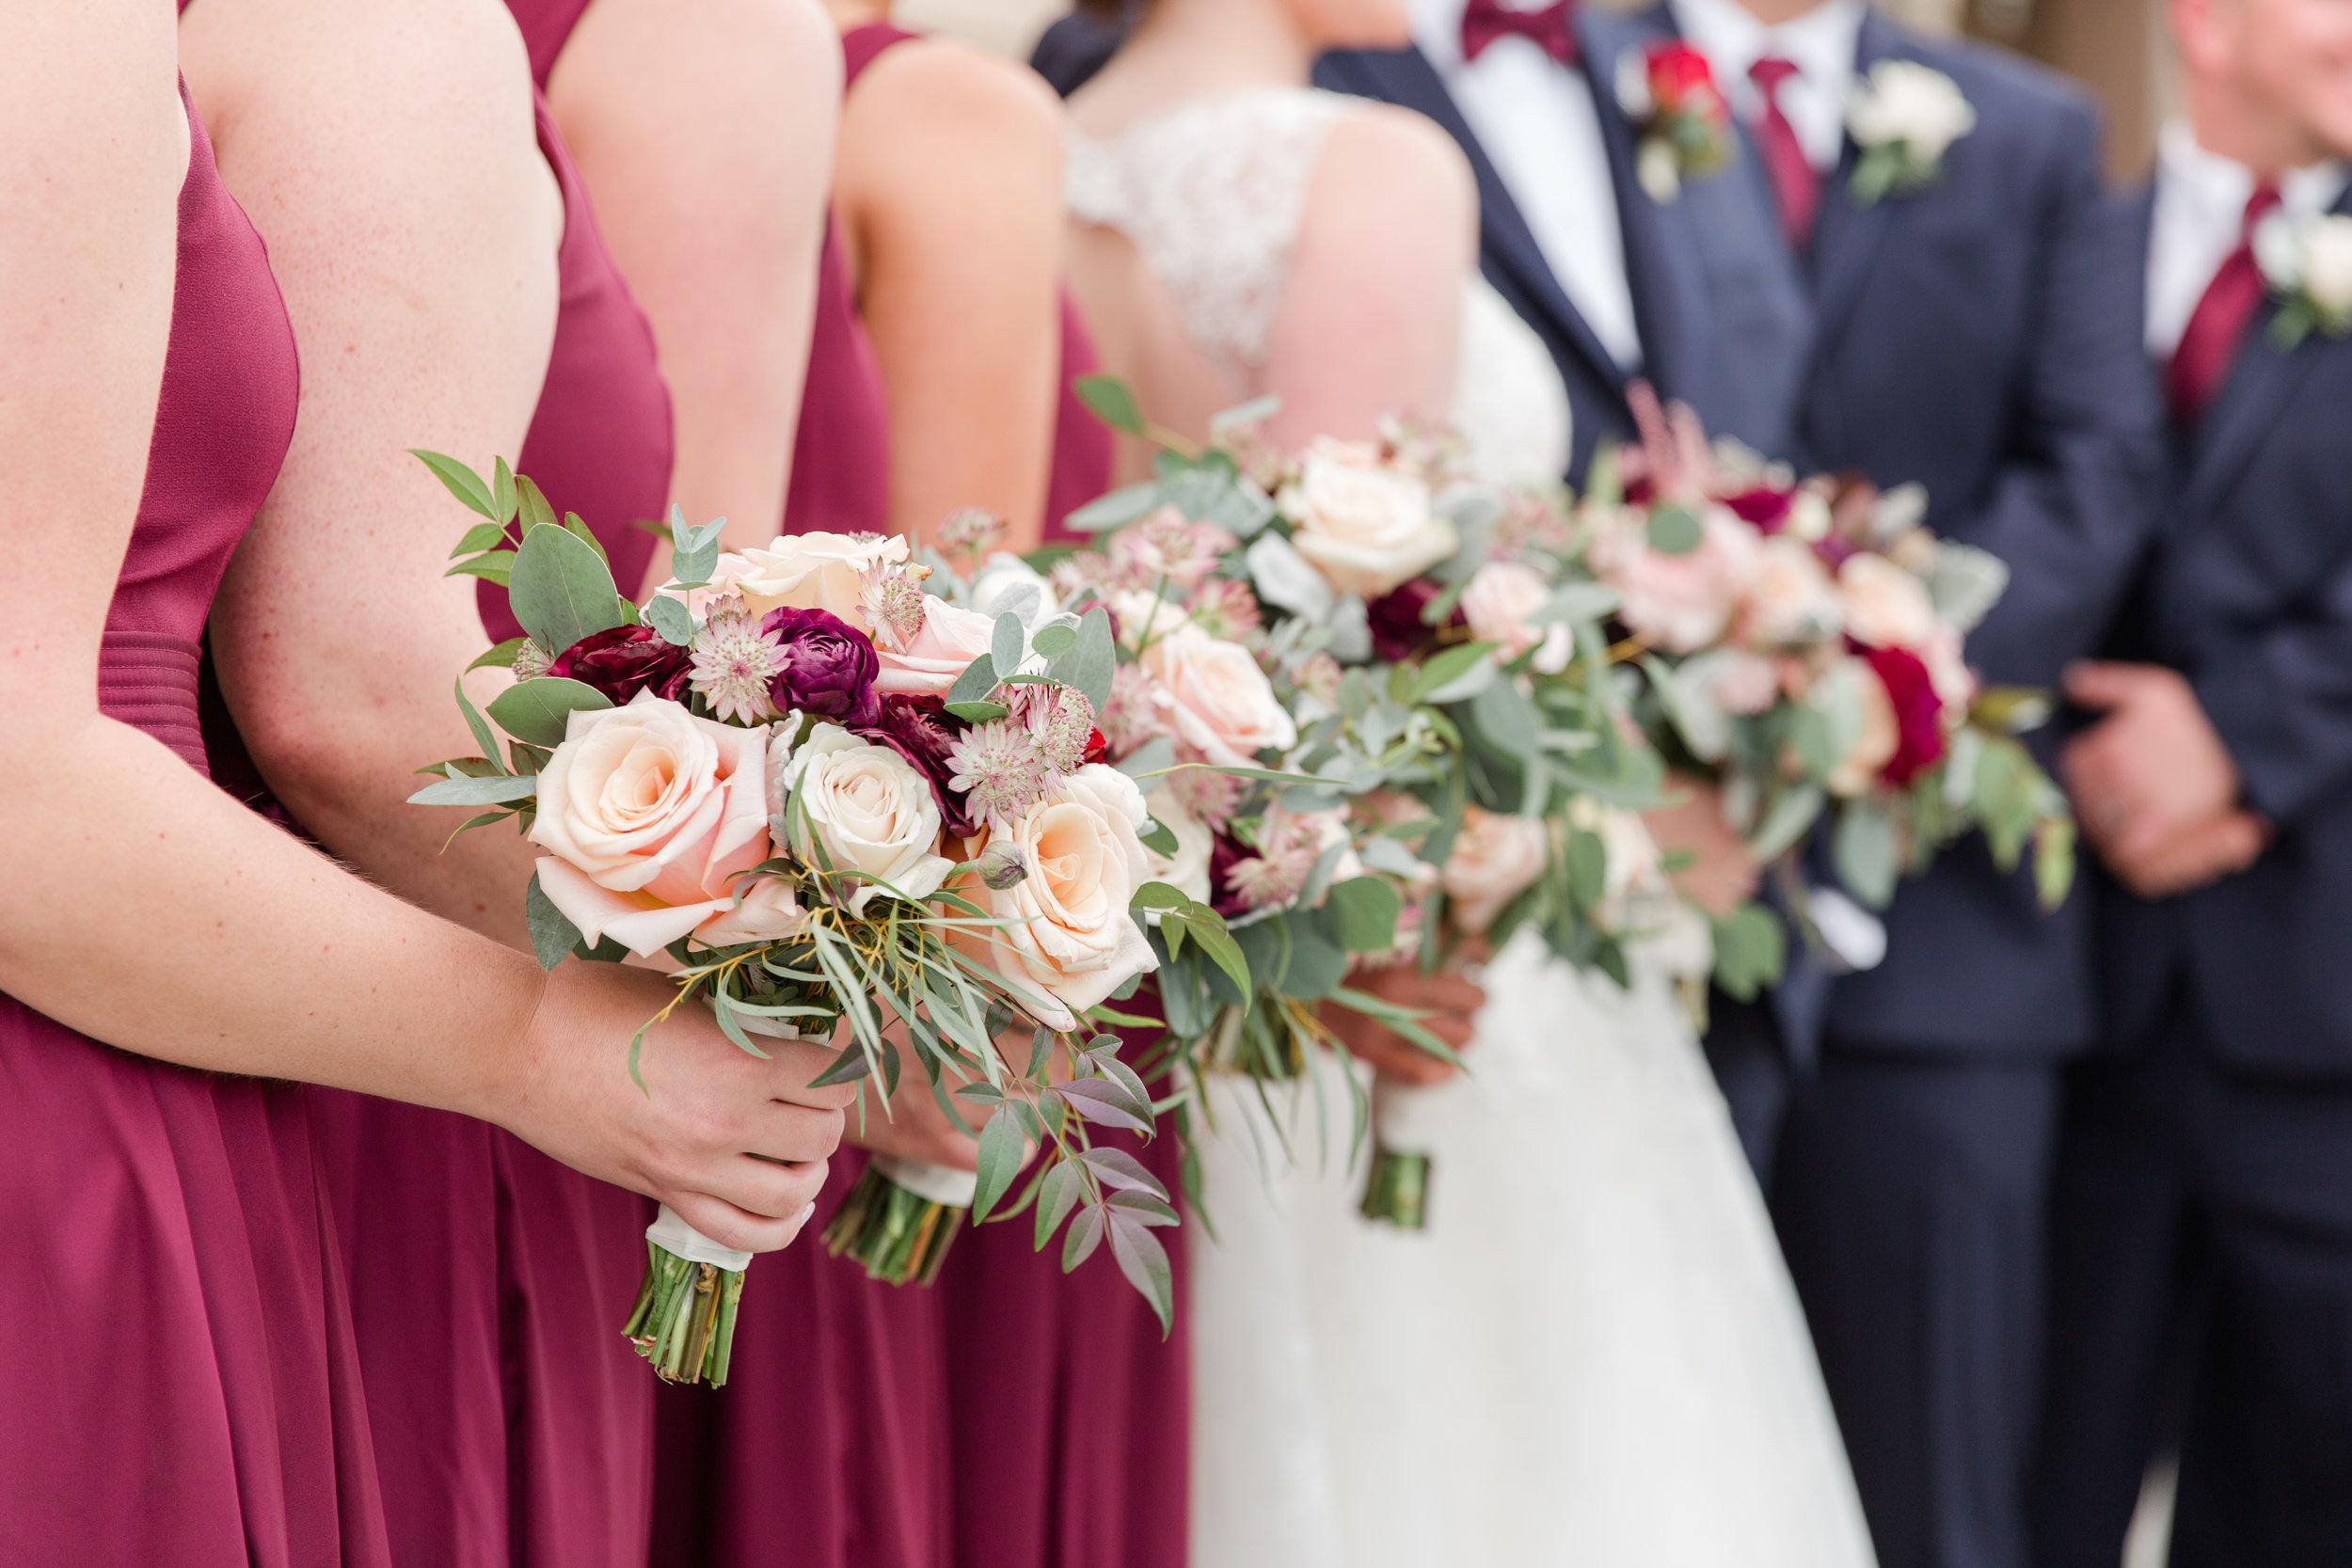 dana-will-wedding-photos-470 - Copy.jpg